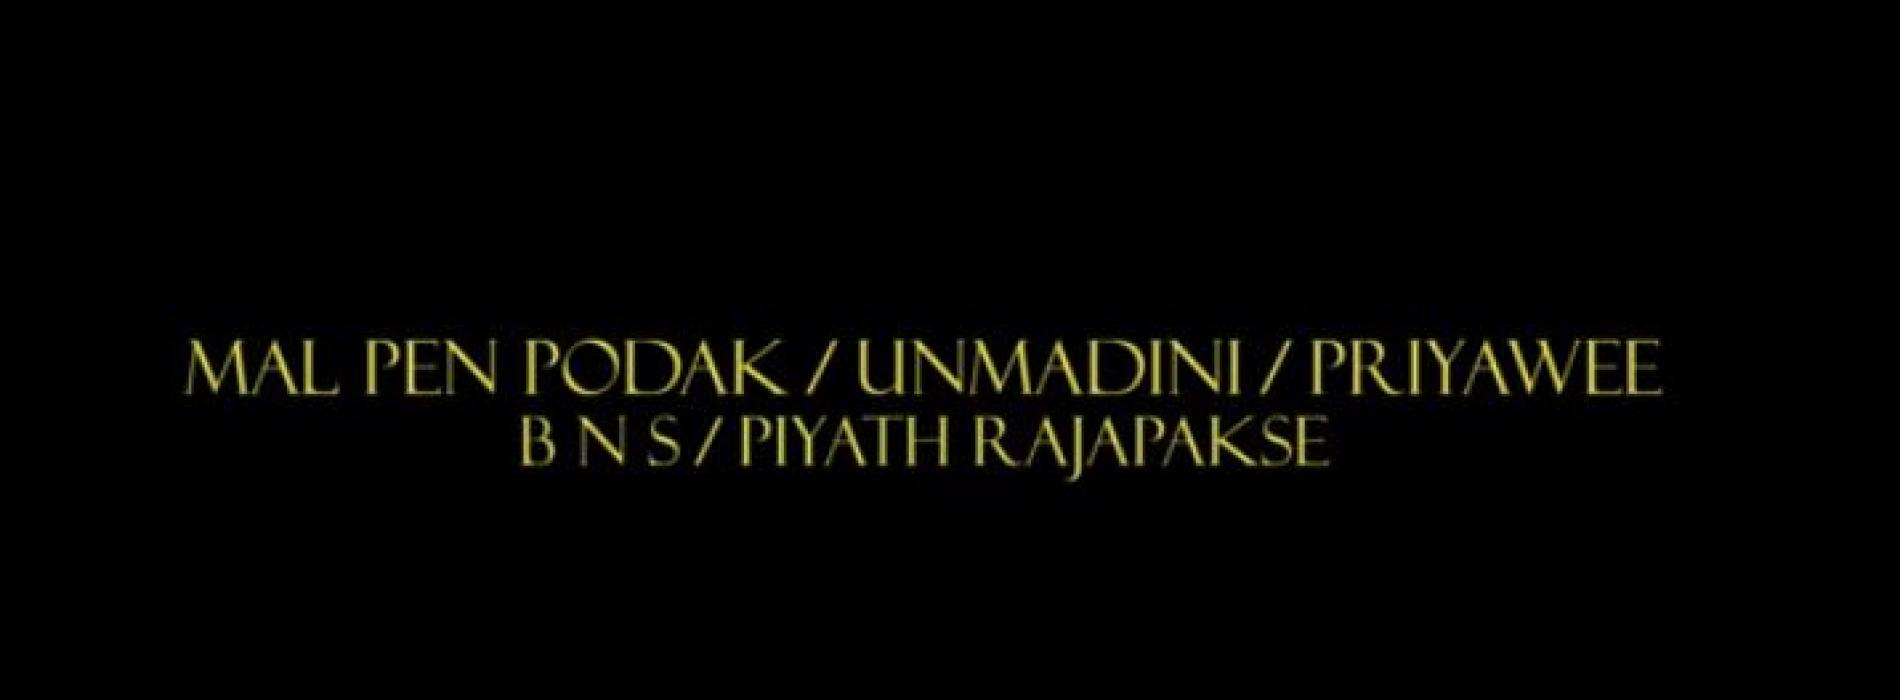 Minesh Dissanayake – Mal Pen Podak & Unmadini (Mashup Cover)